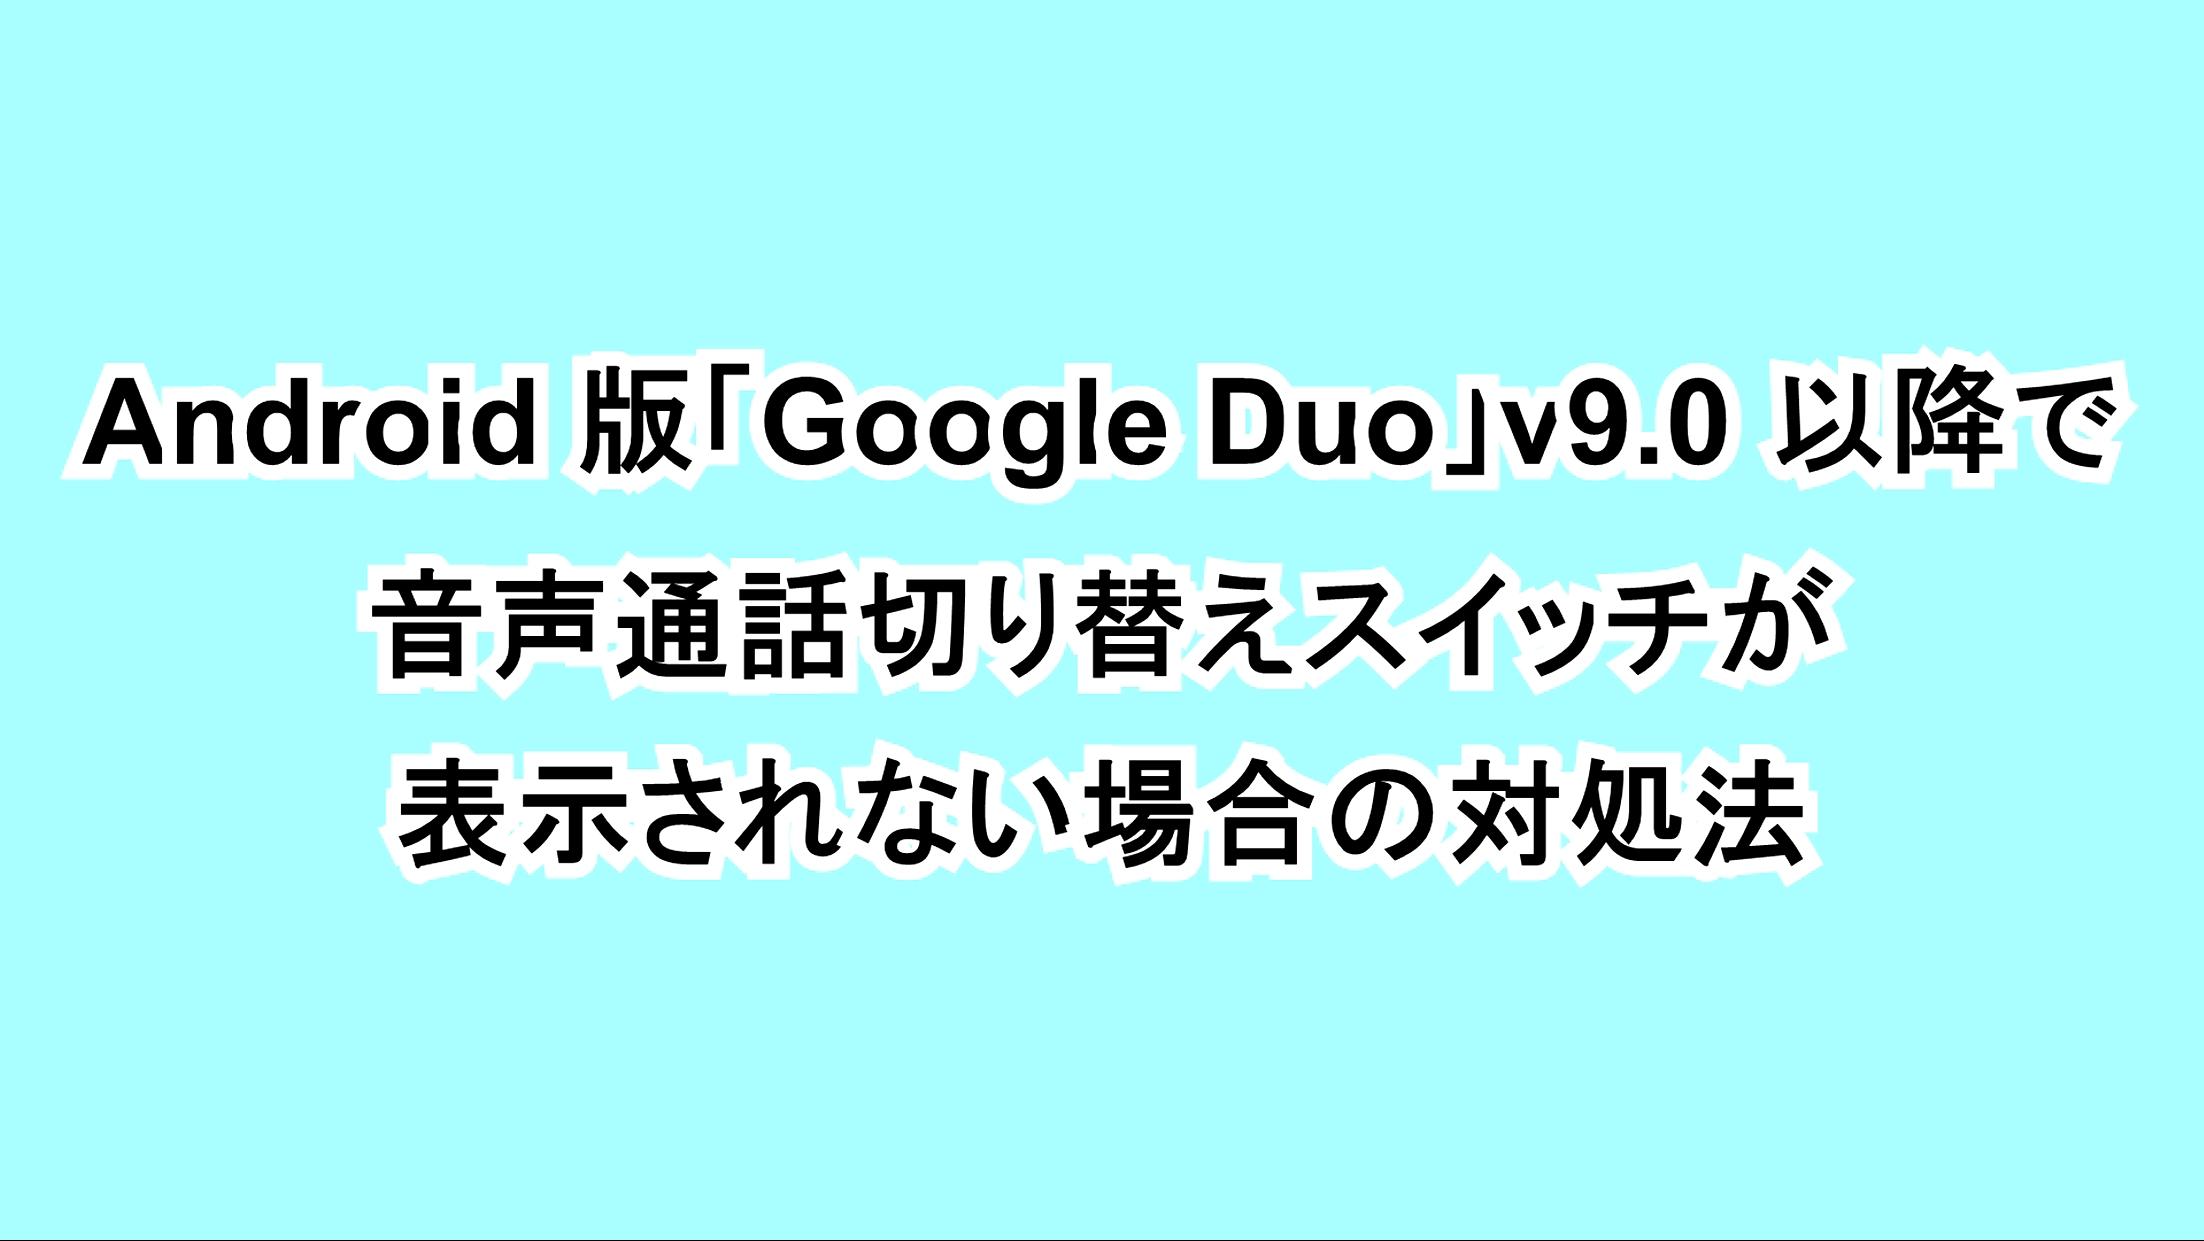 Android版「Google Duo」v9.0以降で音声通話切り替えスイッチが表示されない場合の対処法